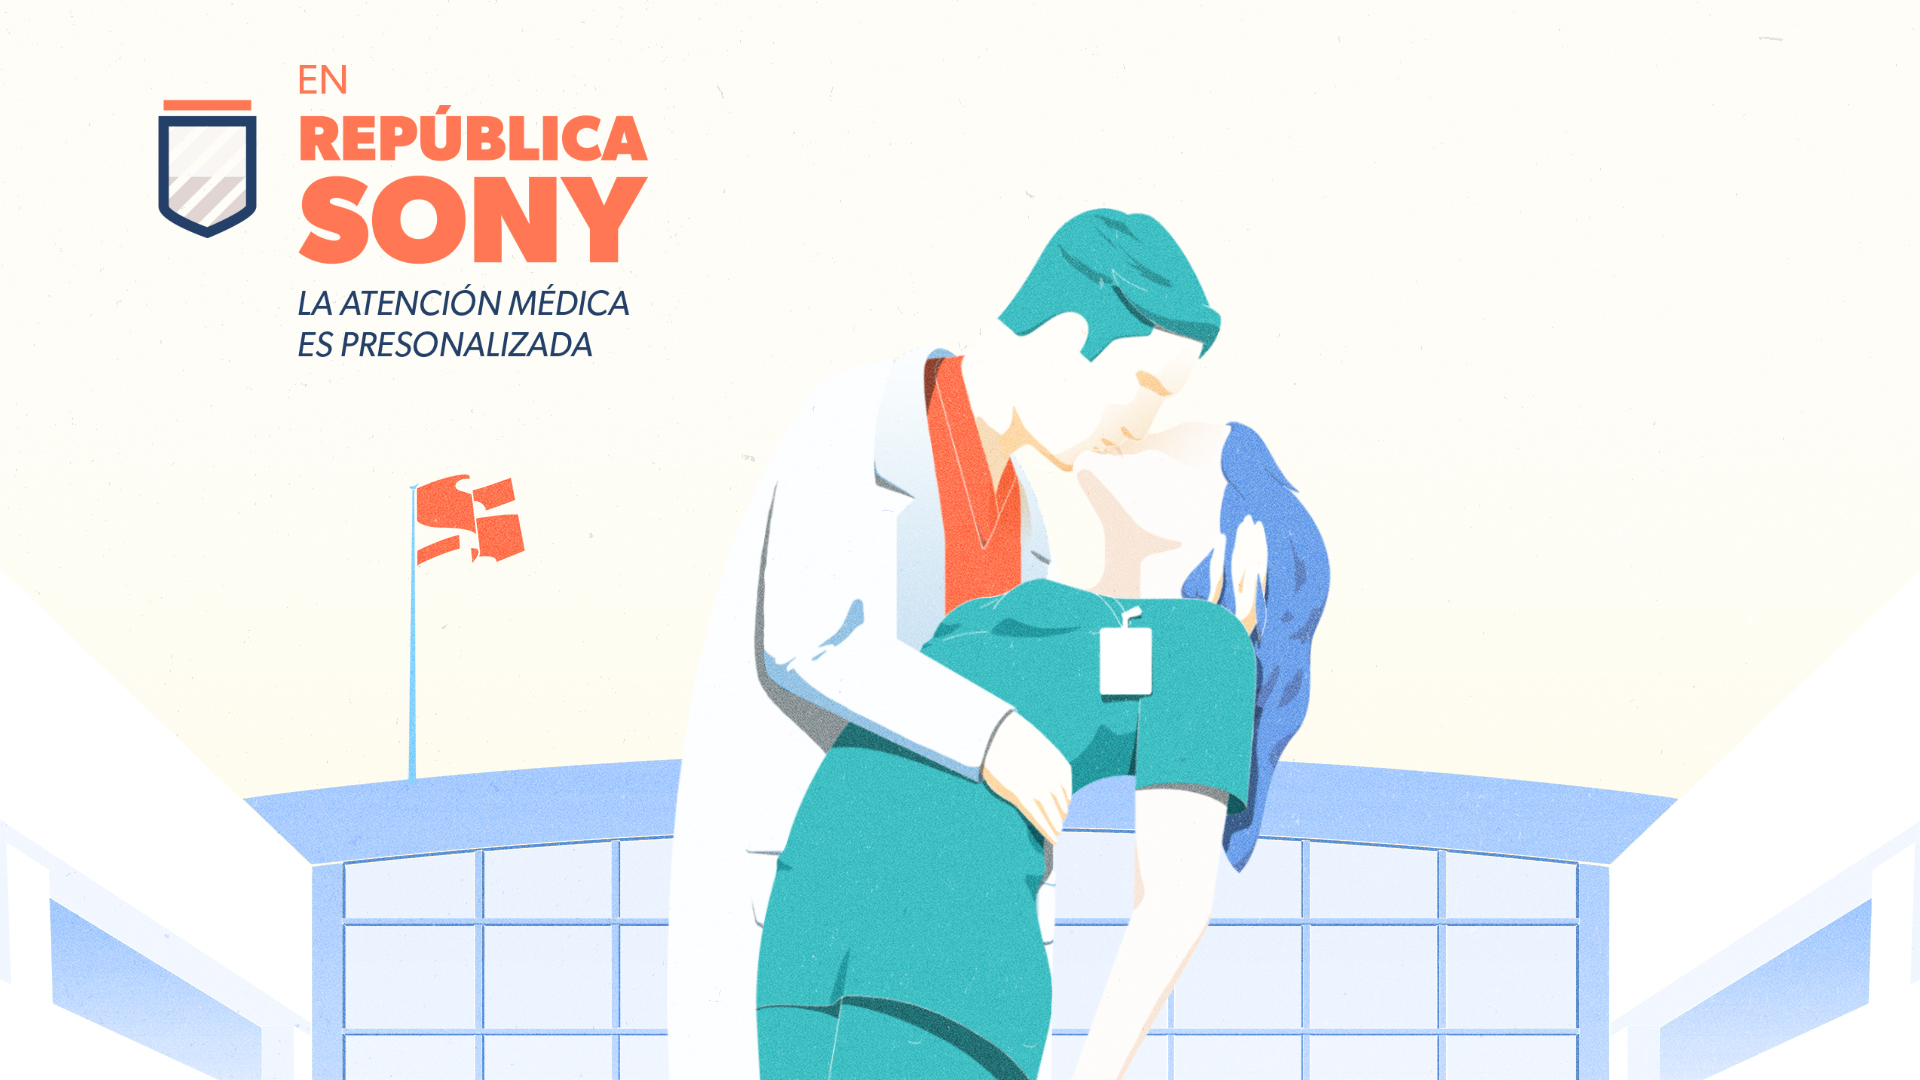 Canal Sony - República Sony Illustration 01